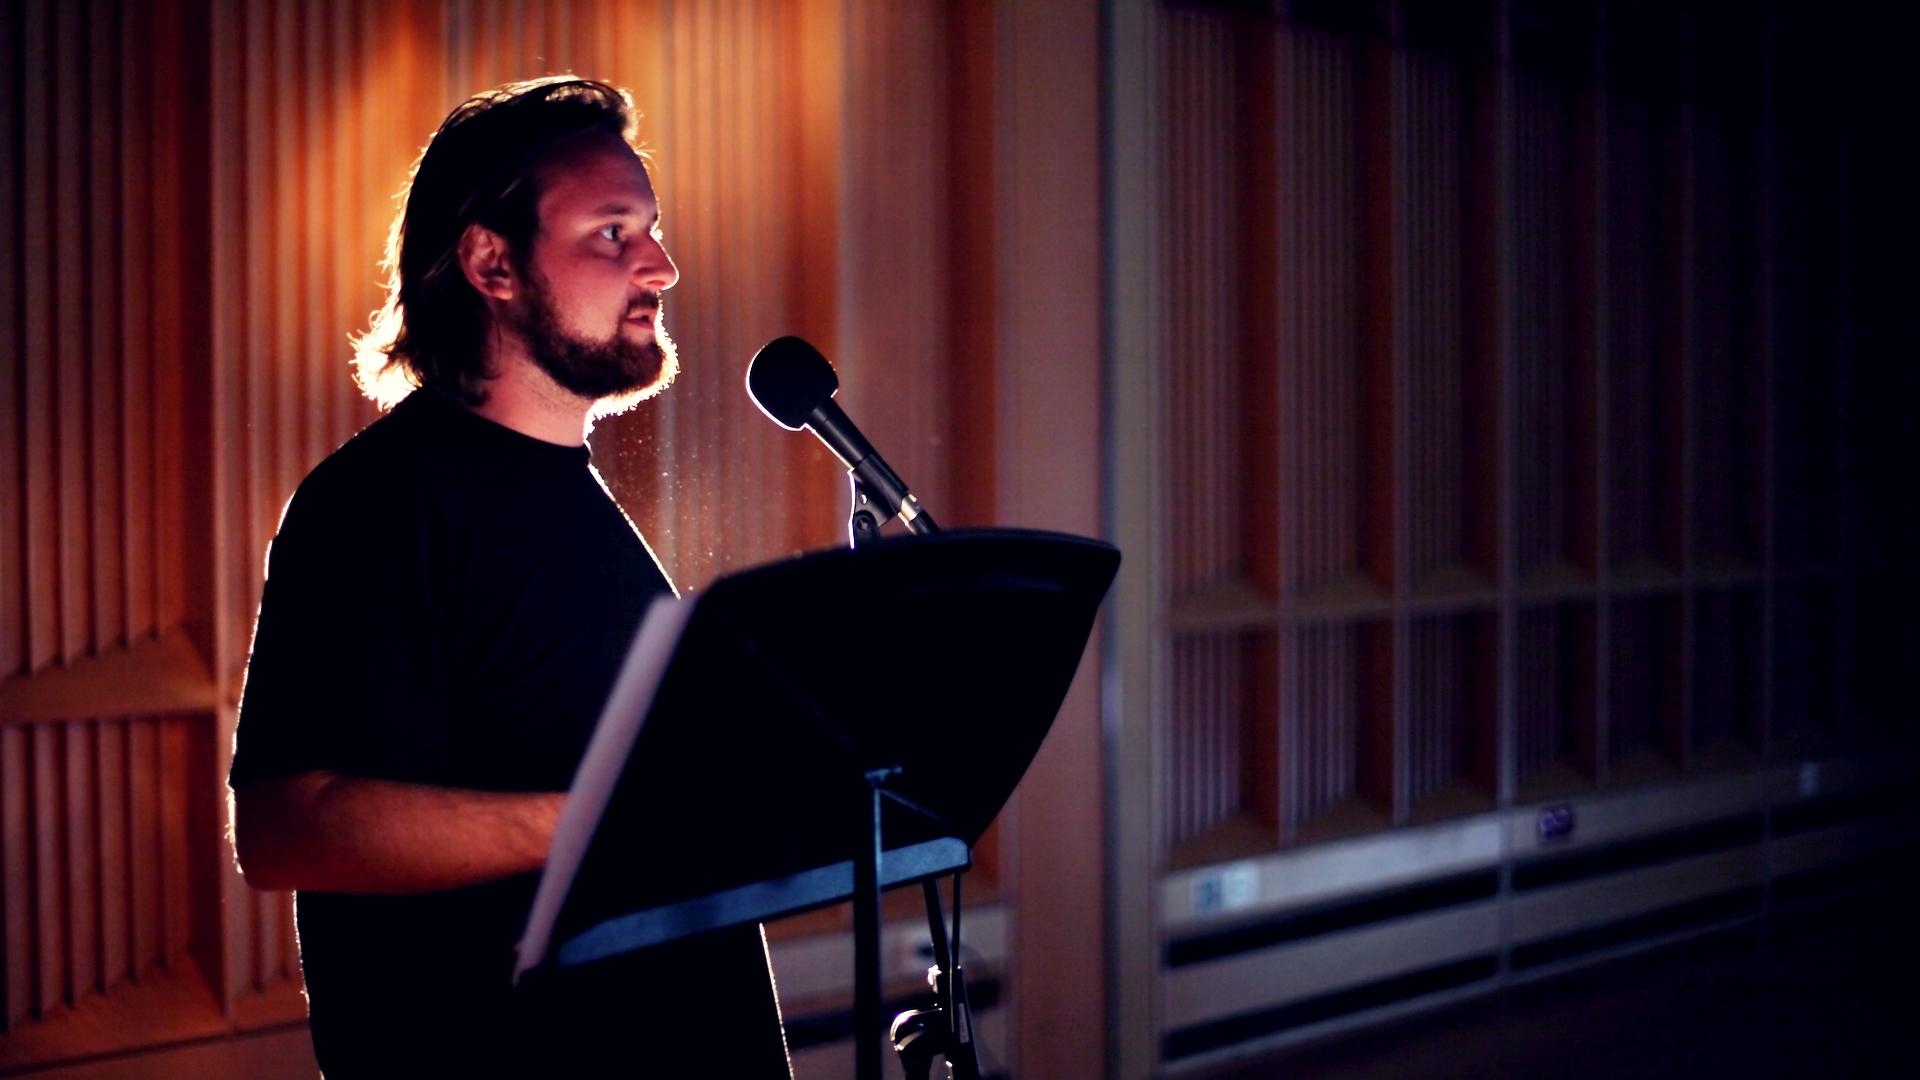 Image of Lorenzo Ciacciavicca